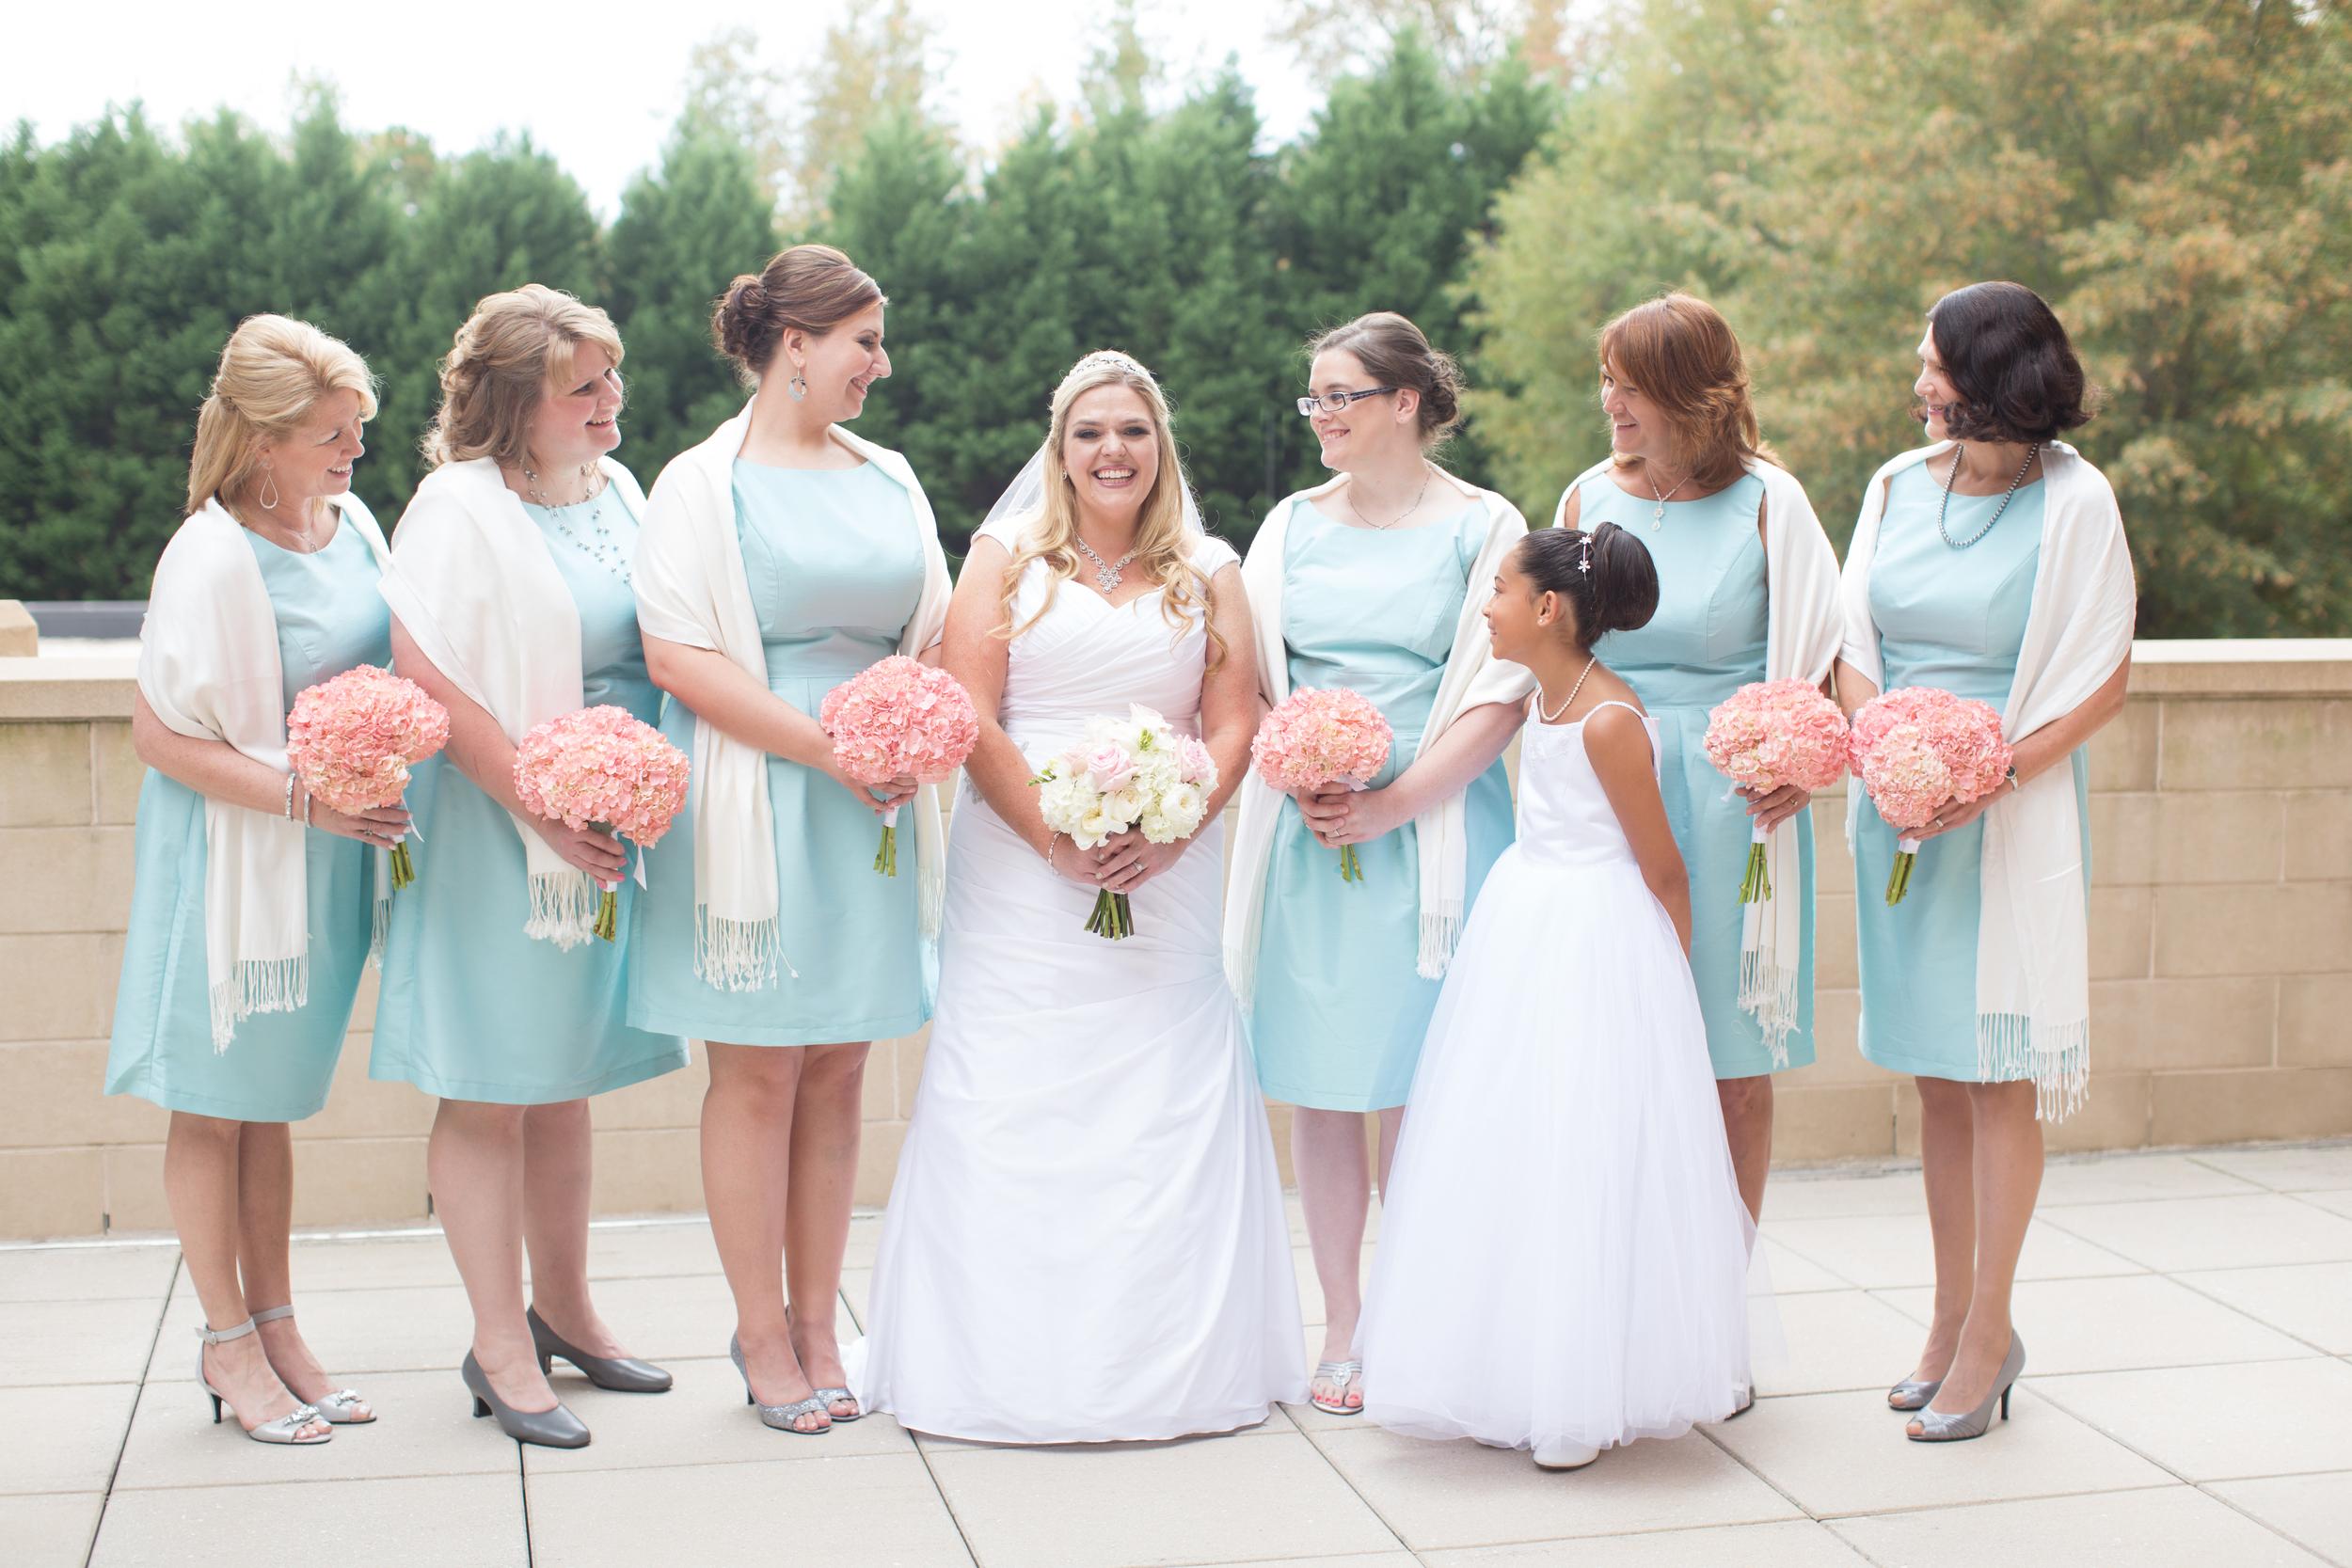 Hough_Wedding_North_Carolina_Charlotte_JonCourvillePhotography-312.jpg